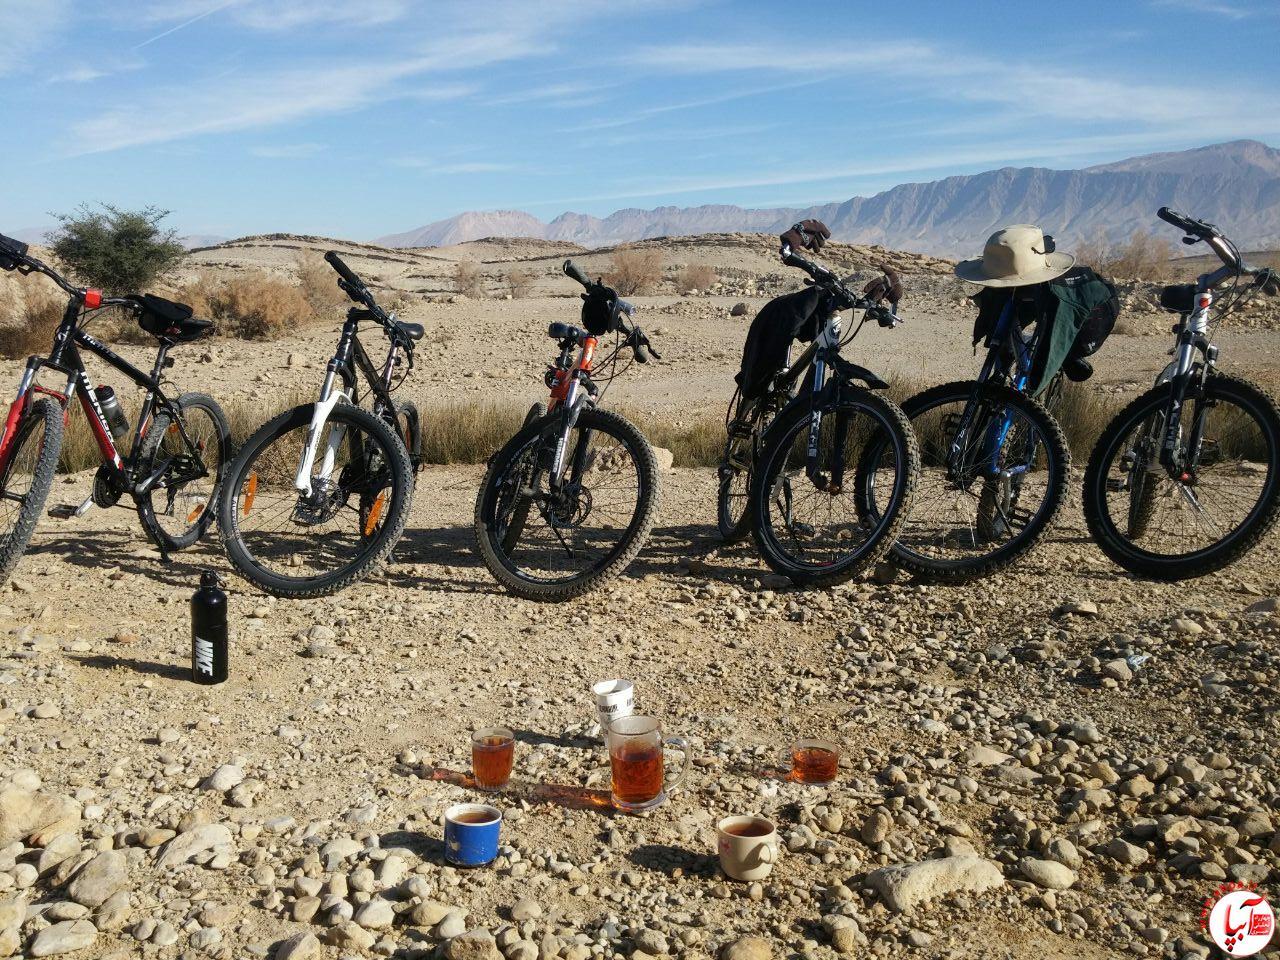 IMG-20170201-WA0008 توسعه فرهنگی با رکاب دوچرخه سواران